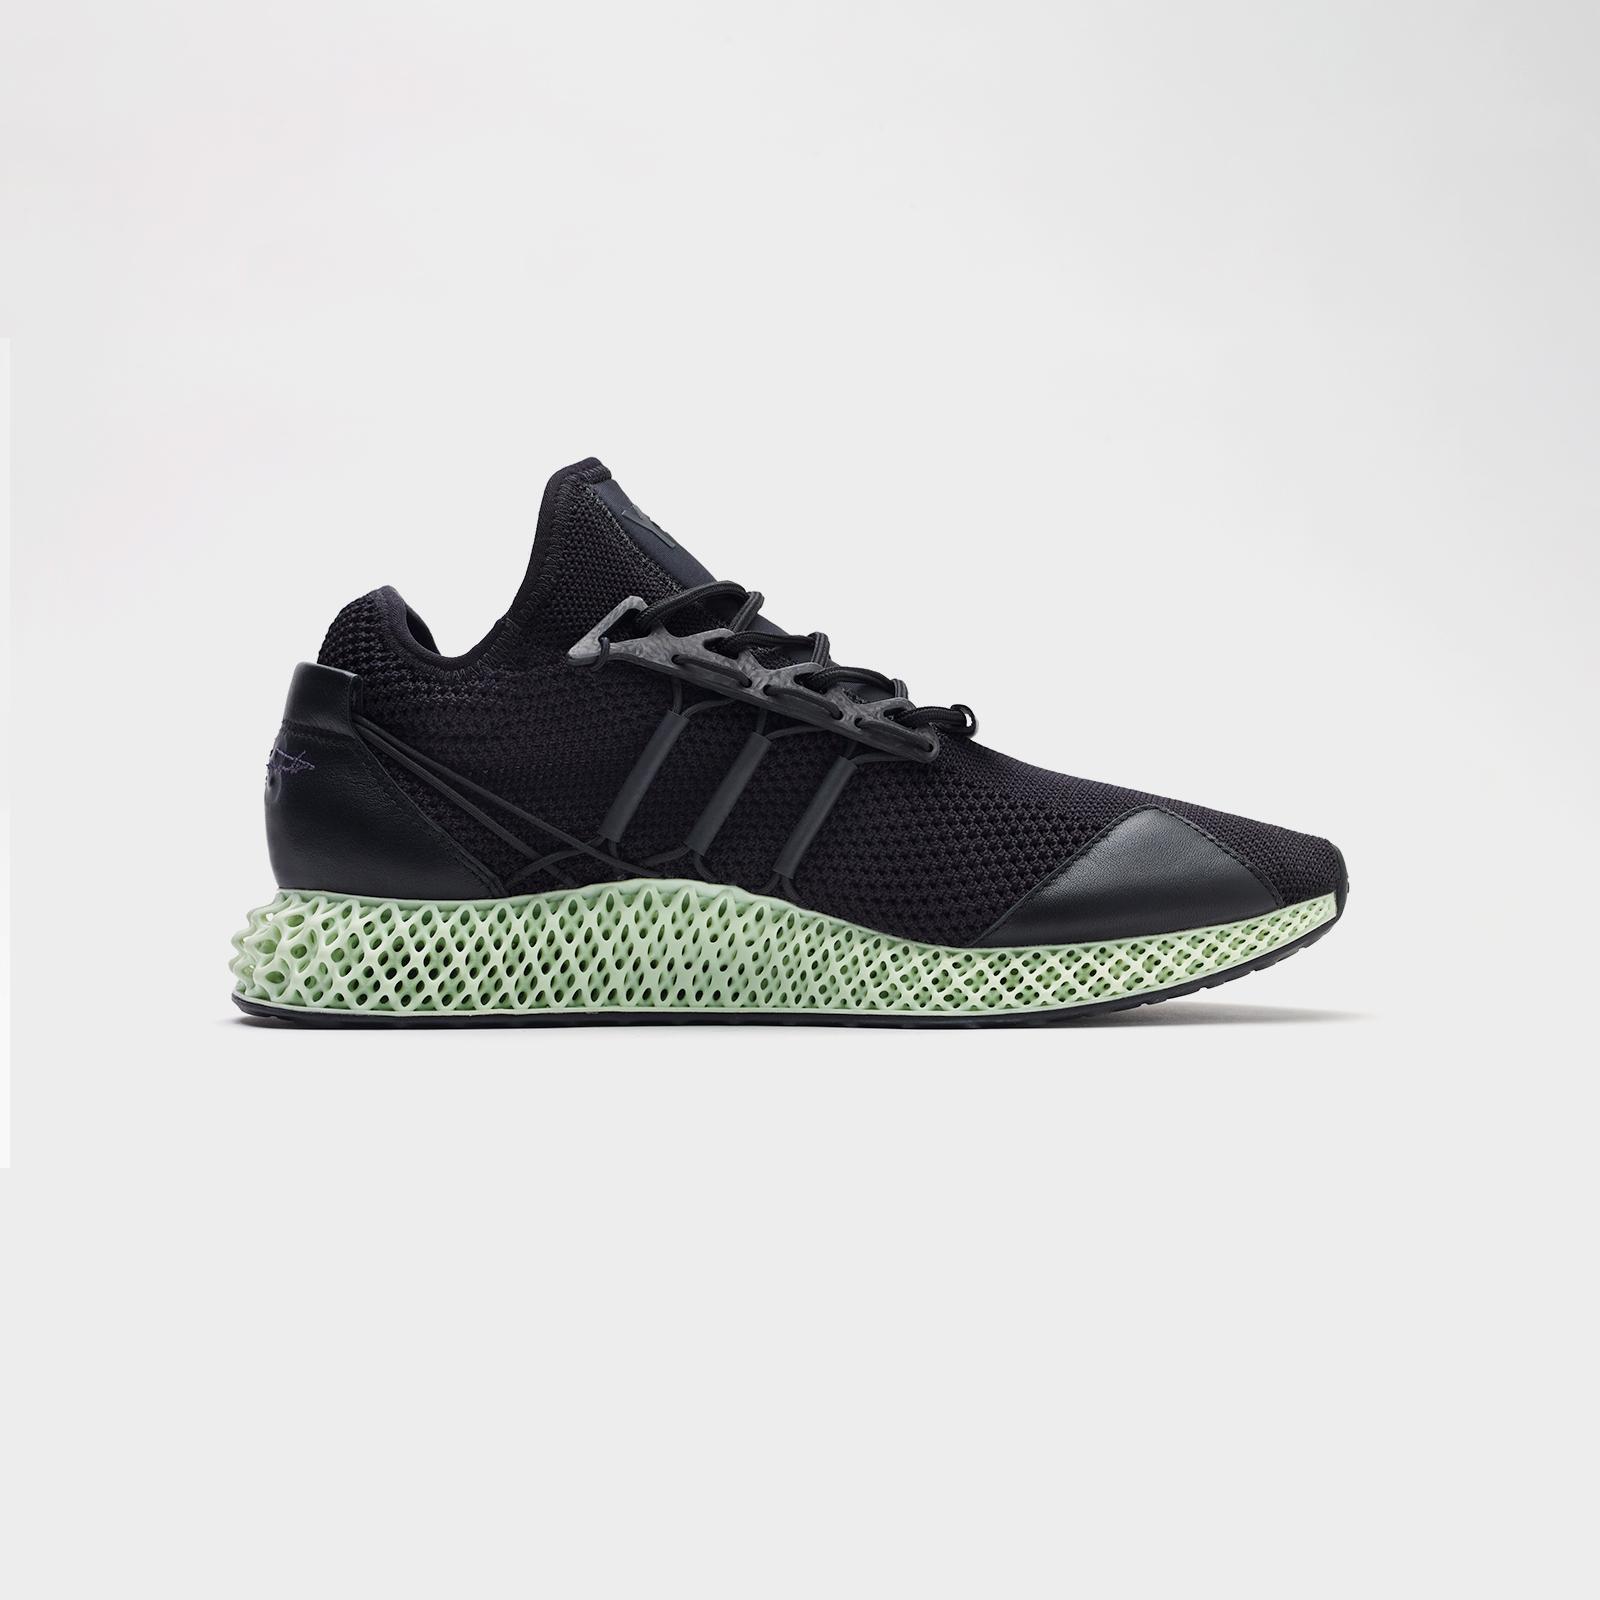 adidas Y 3 Runner 4D II Cg6607 Basketsnstuff Baskets